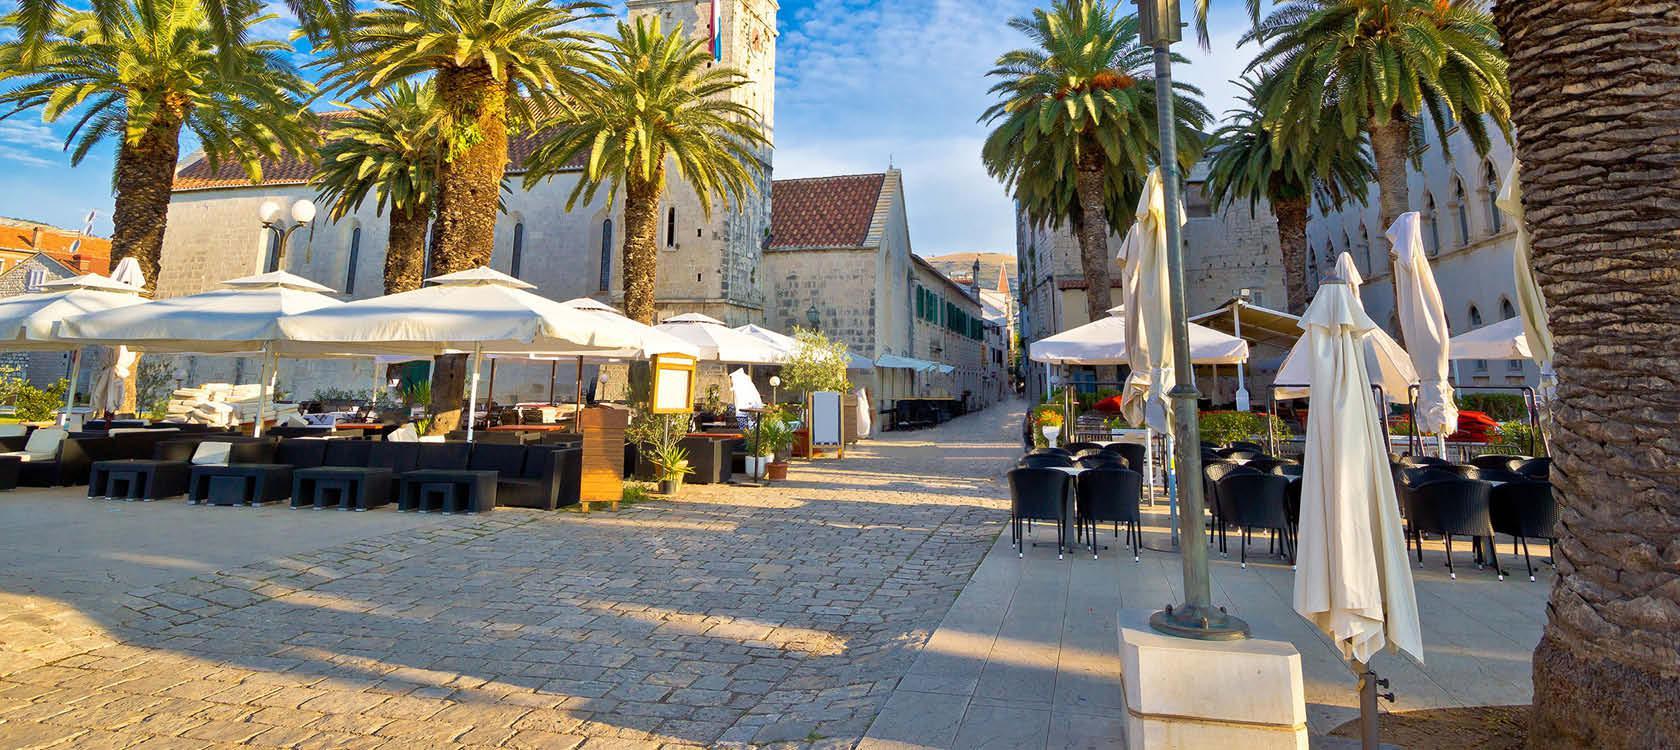 Kroatiens smukke sk�rg�rd